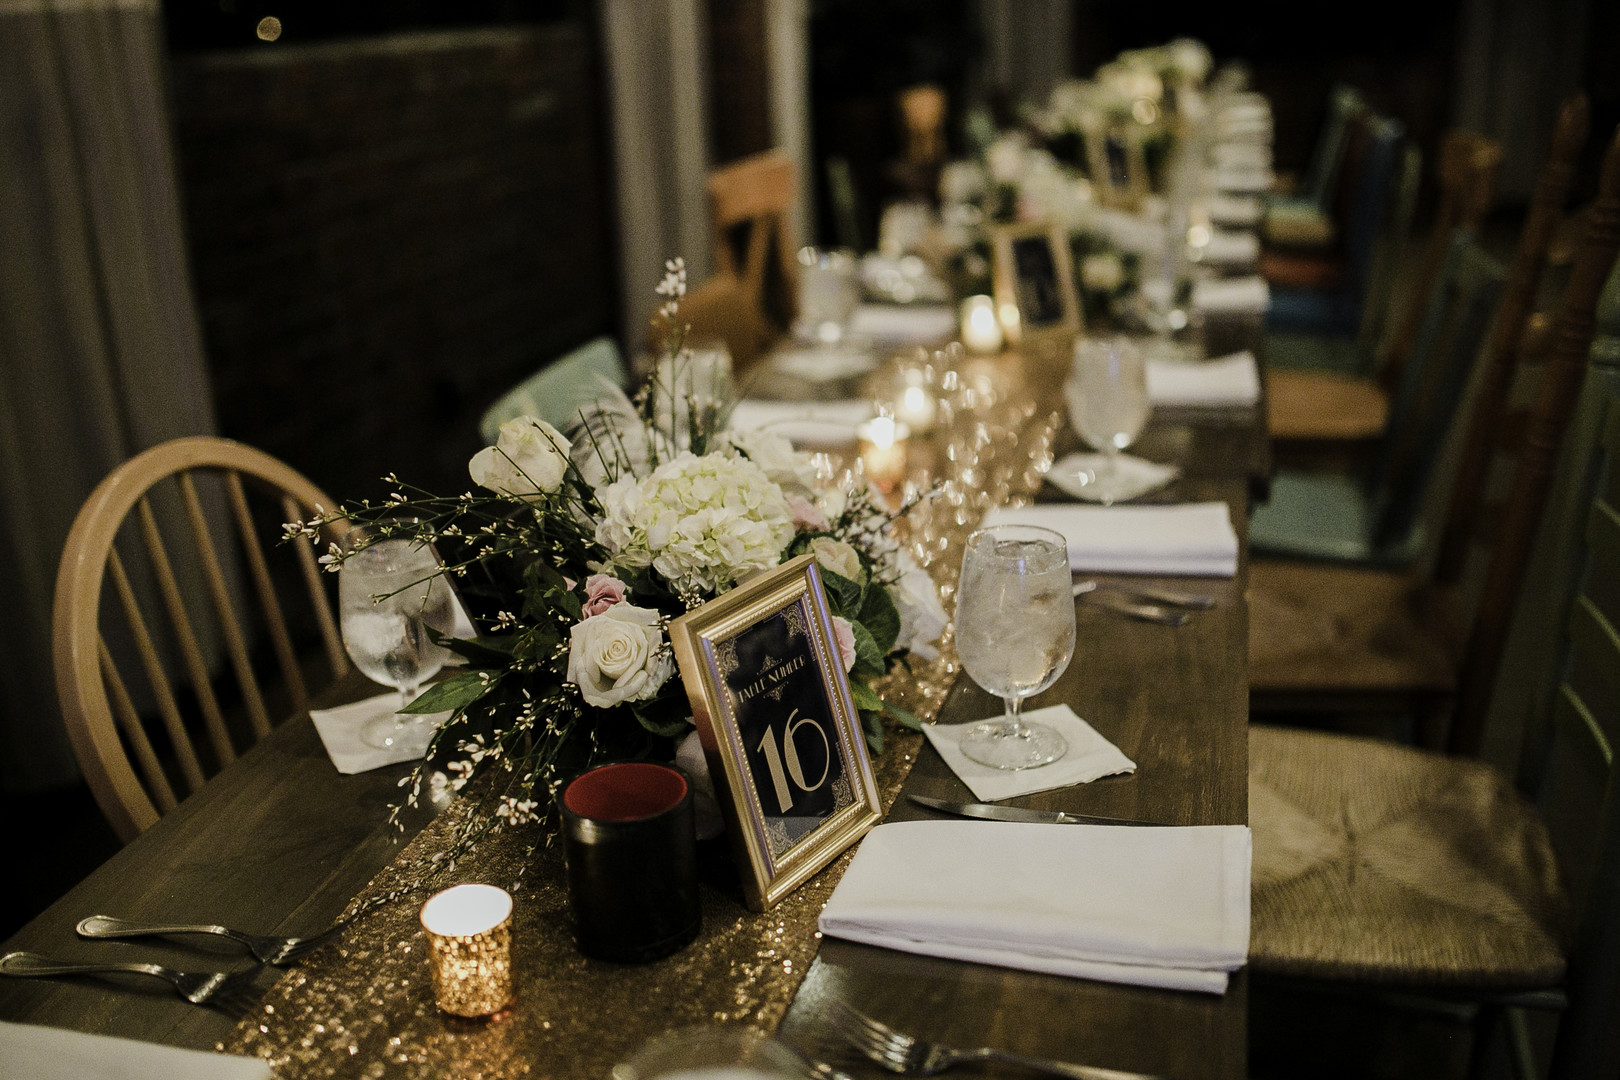 soho-south-cafe-wedding-33.jpg